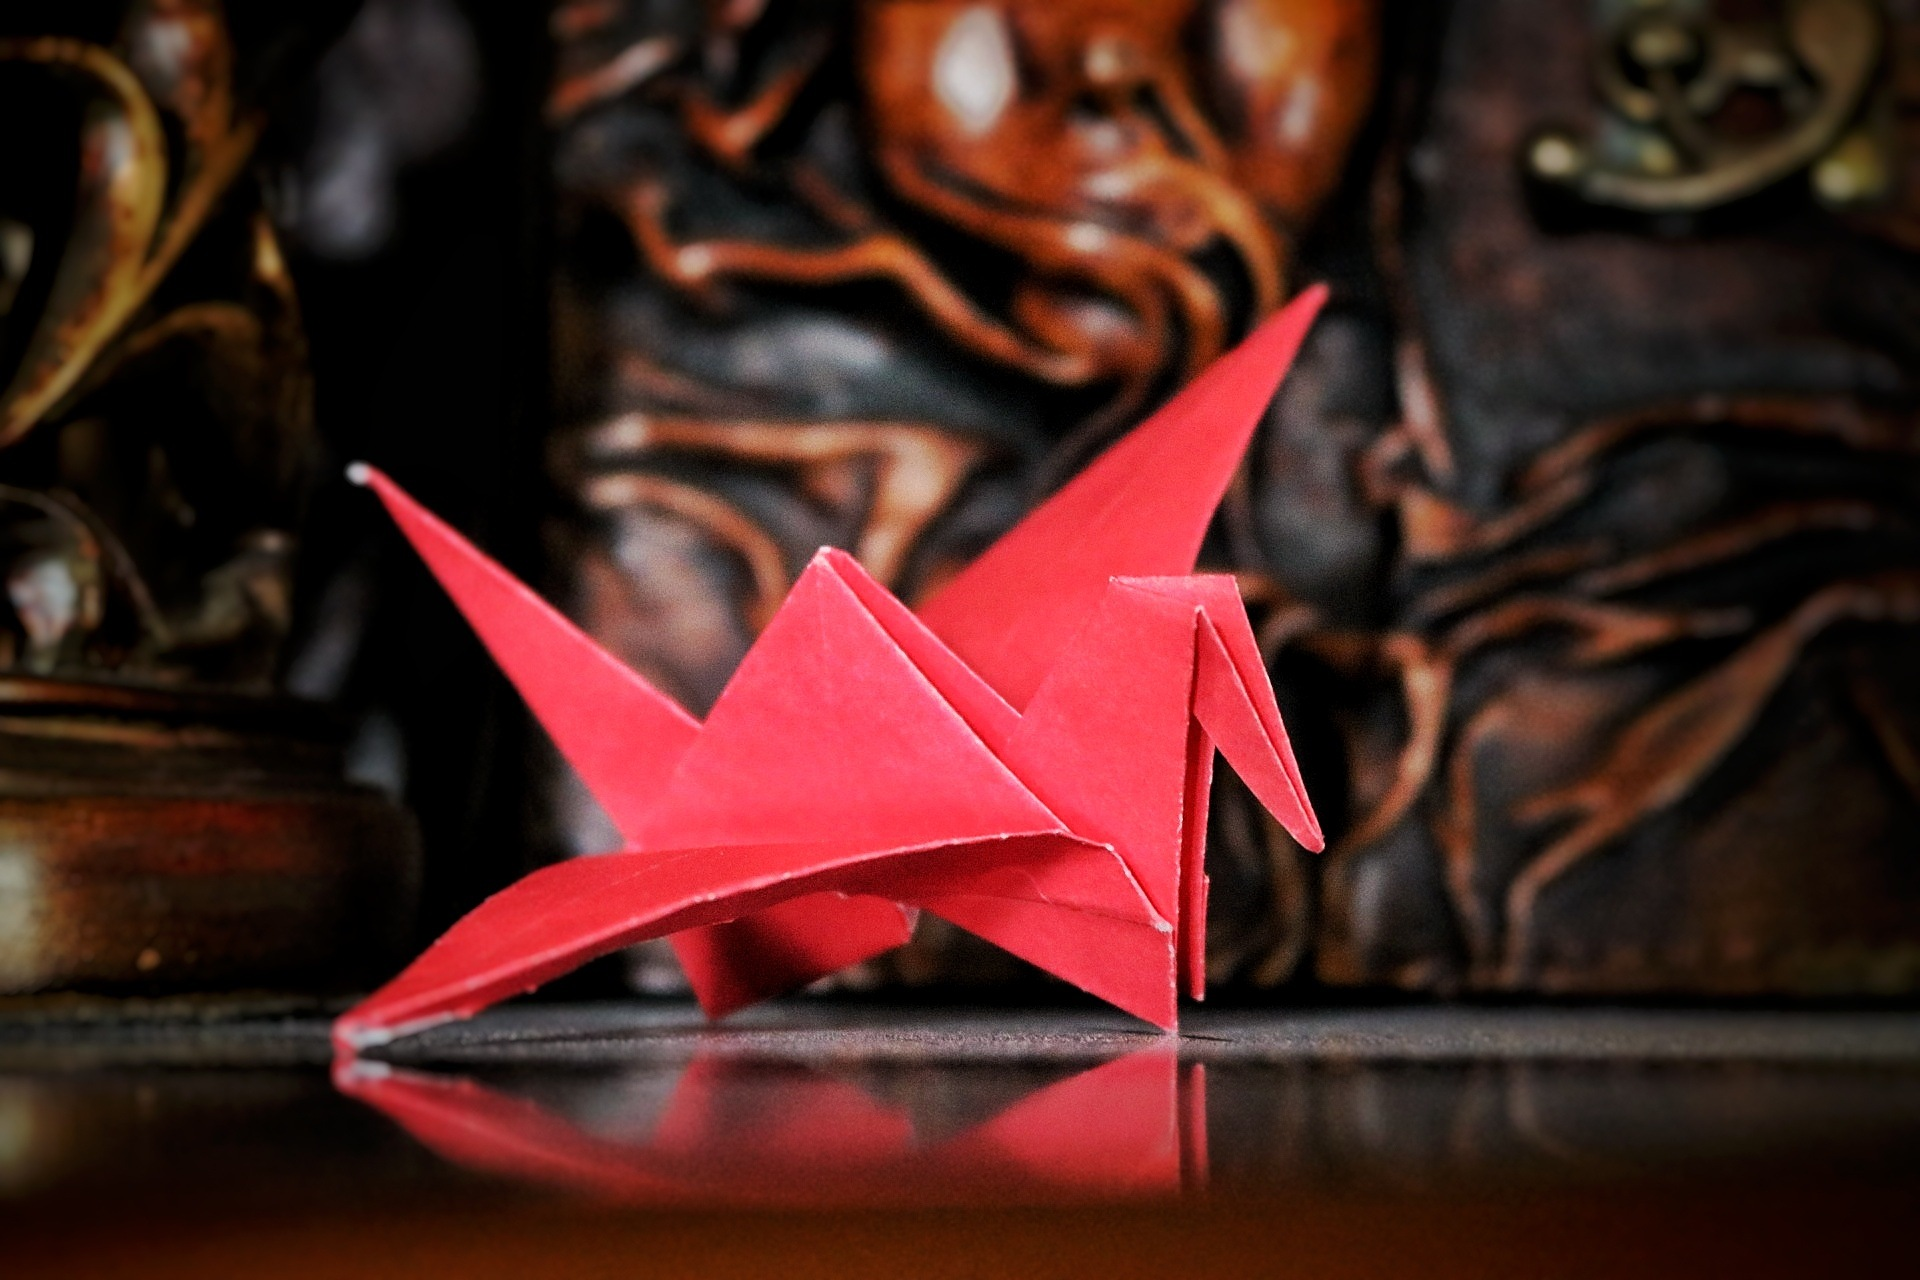 Origami Crane by Callum Cavanagh